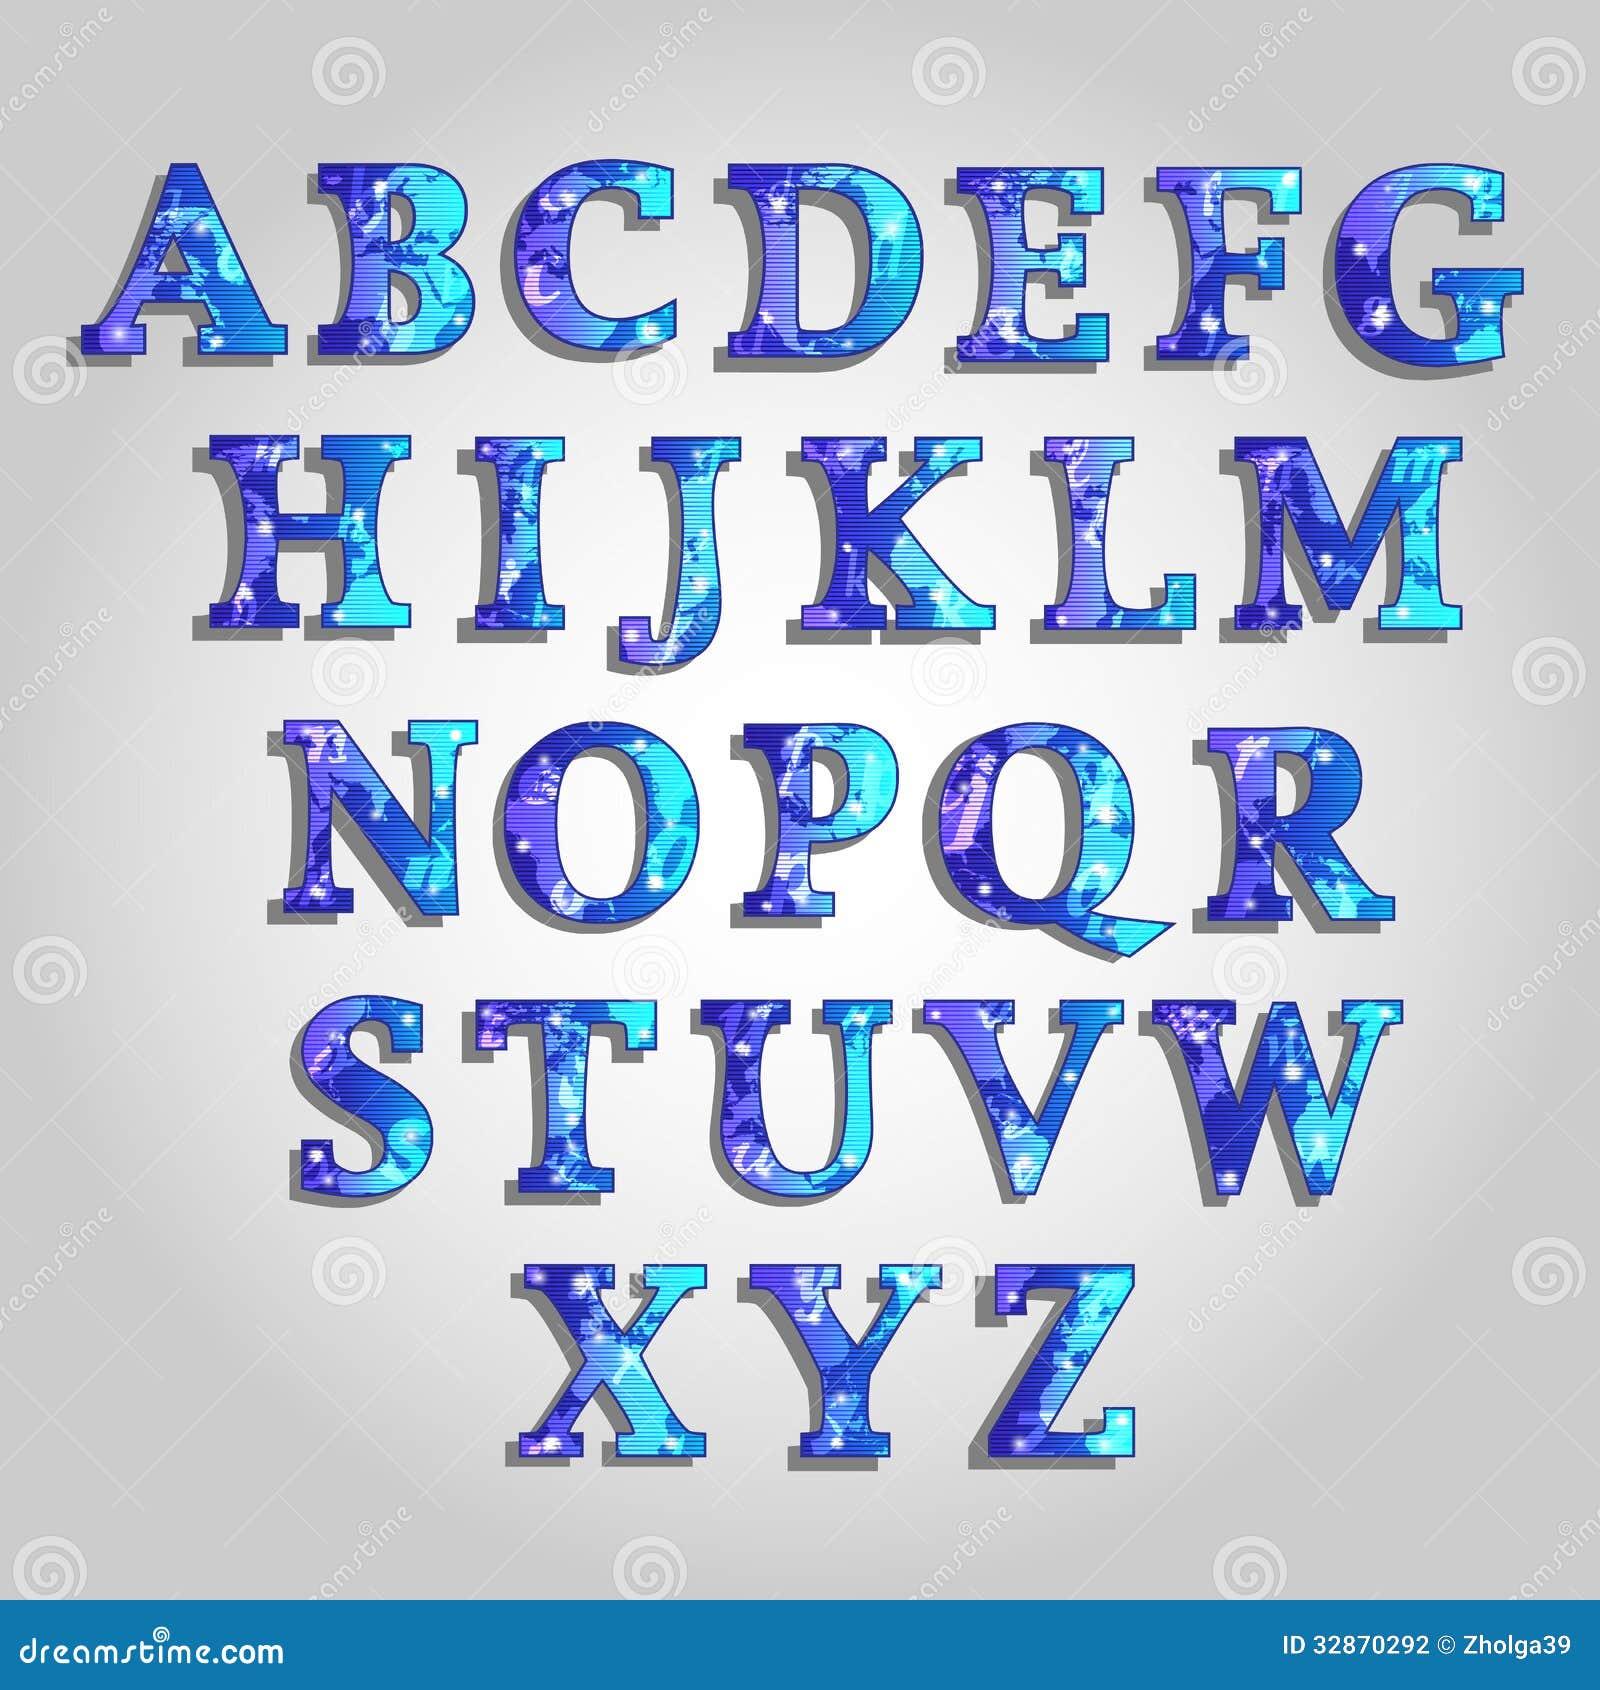 Alphabet Stock Illustration. Image Of Present, Pattern